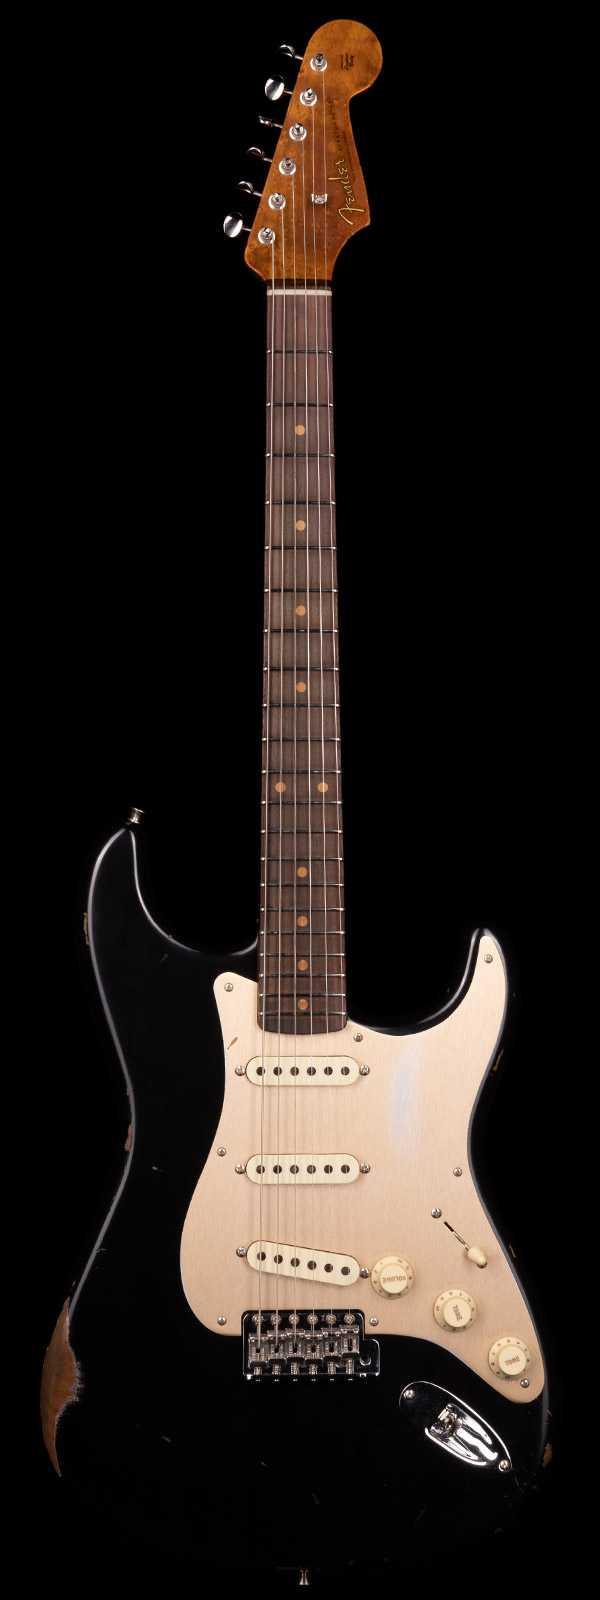 Fender Custom Shop 1960 Stratocaster Relic Roasted Body and Neck Black